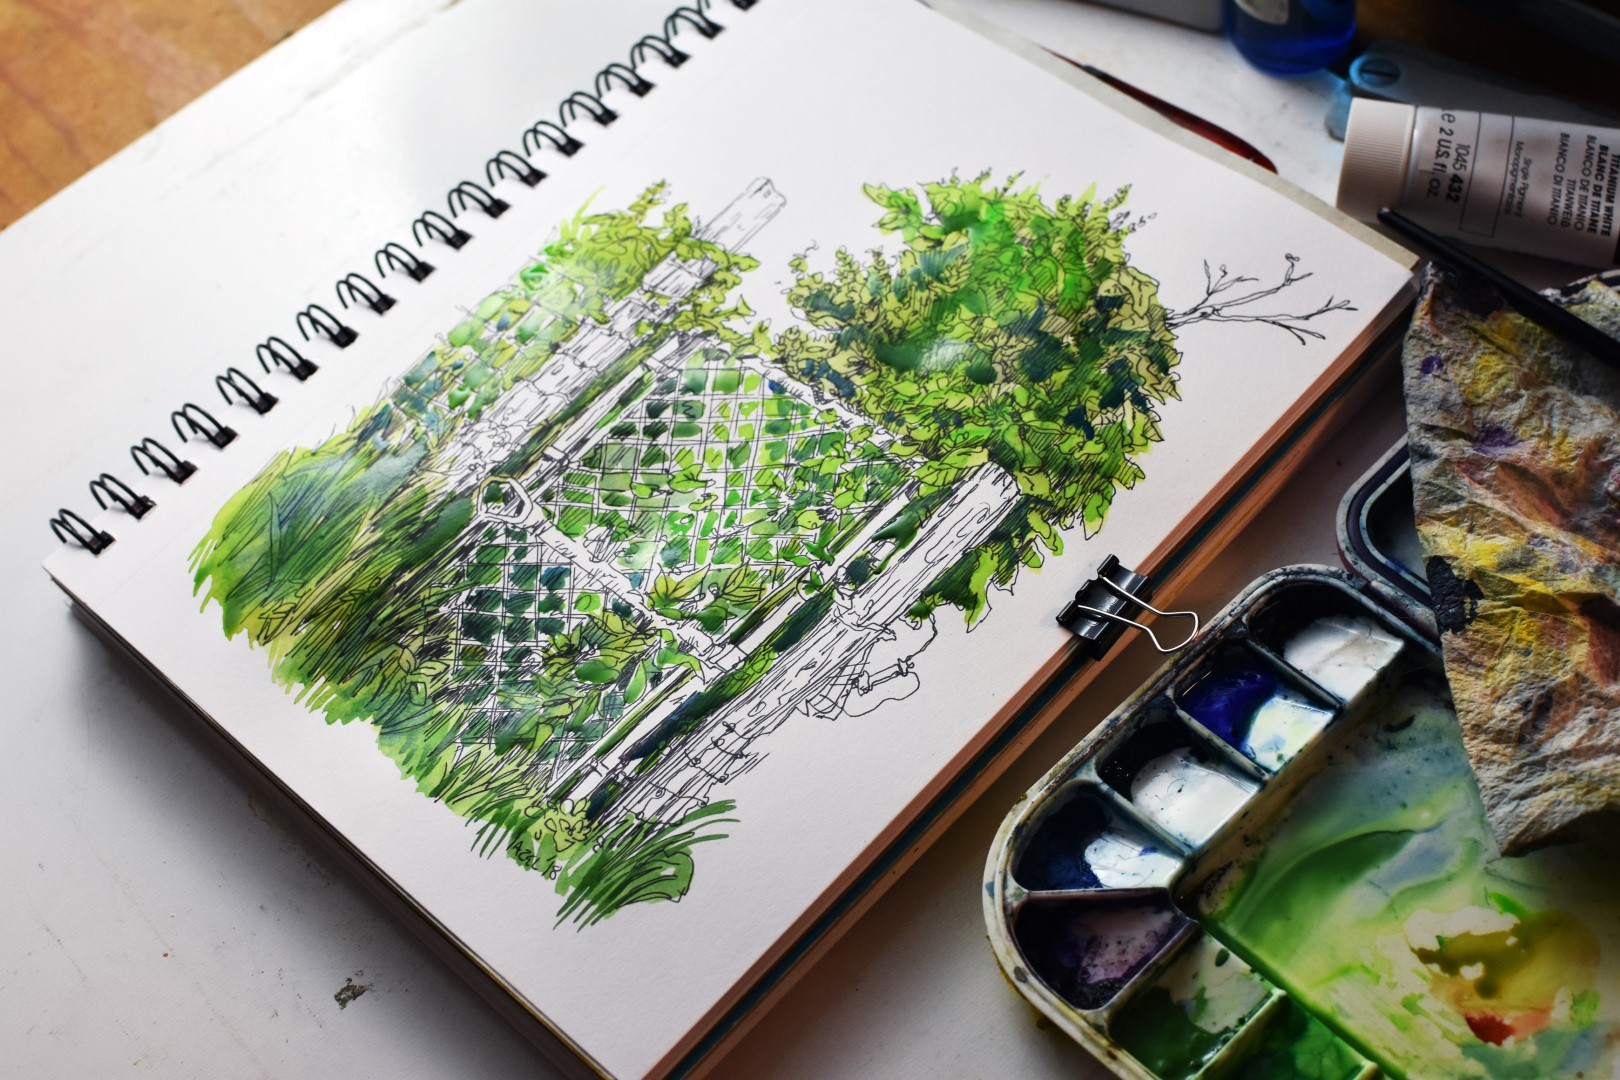 GardenGate_2018_01 (Large).jpg